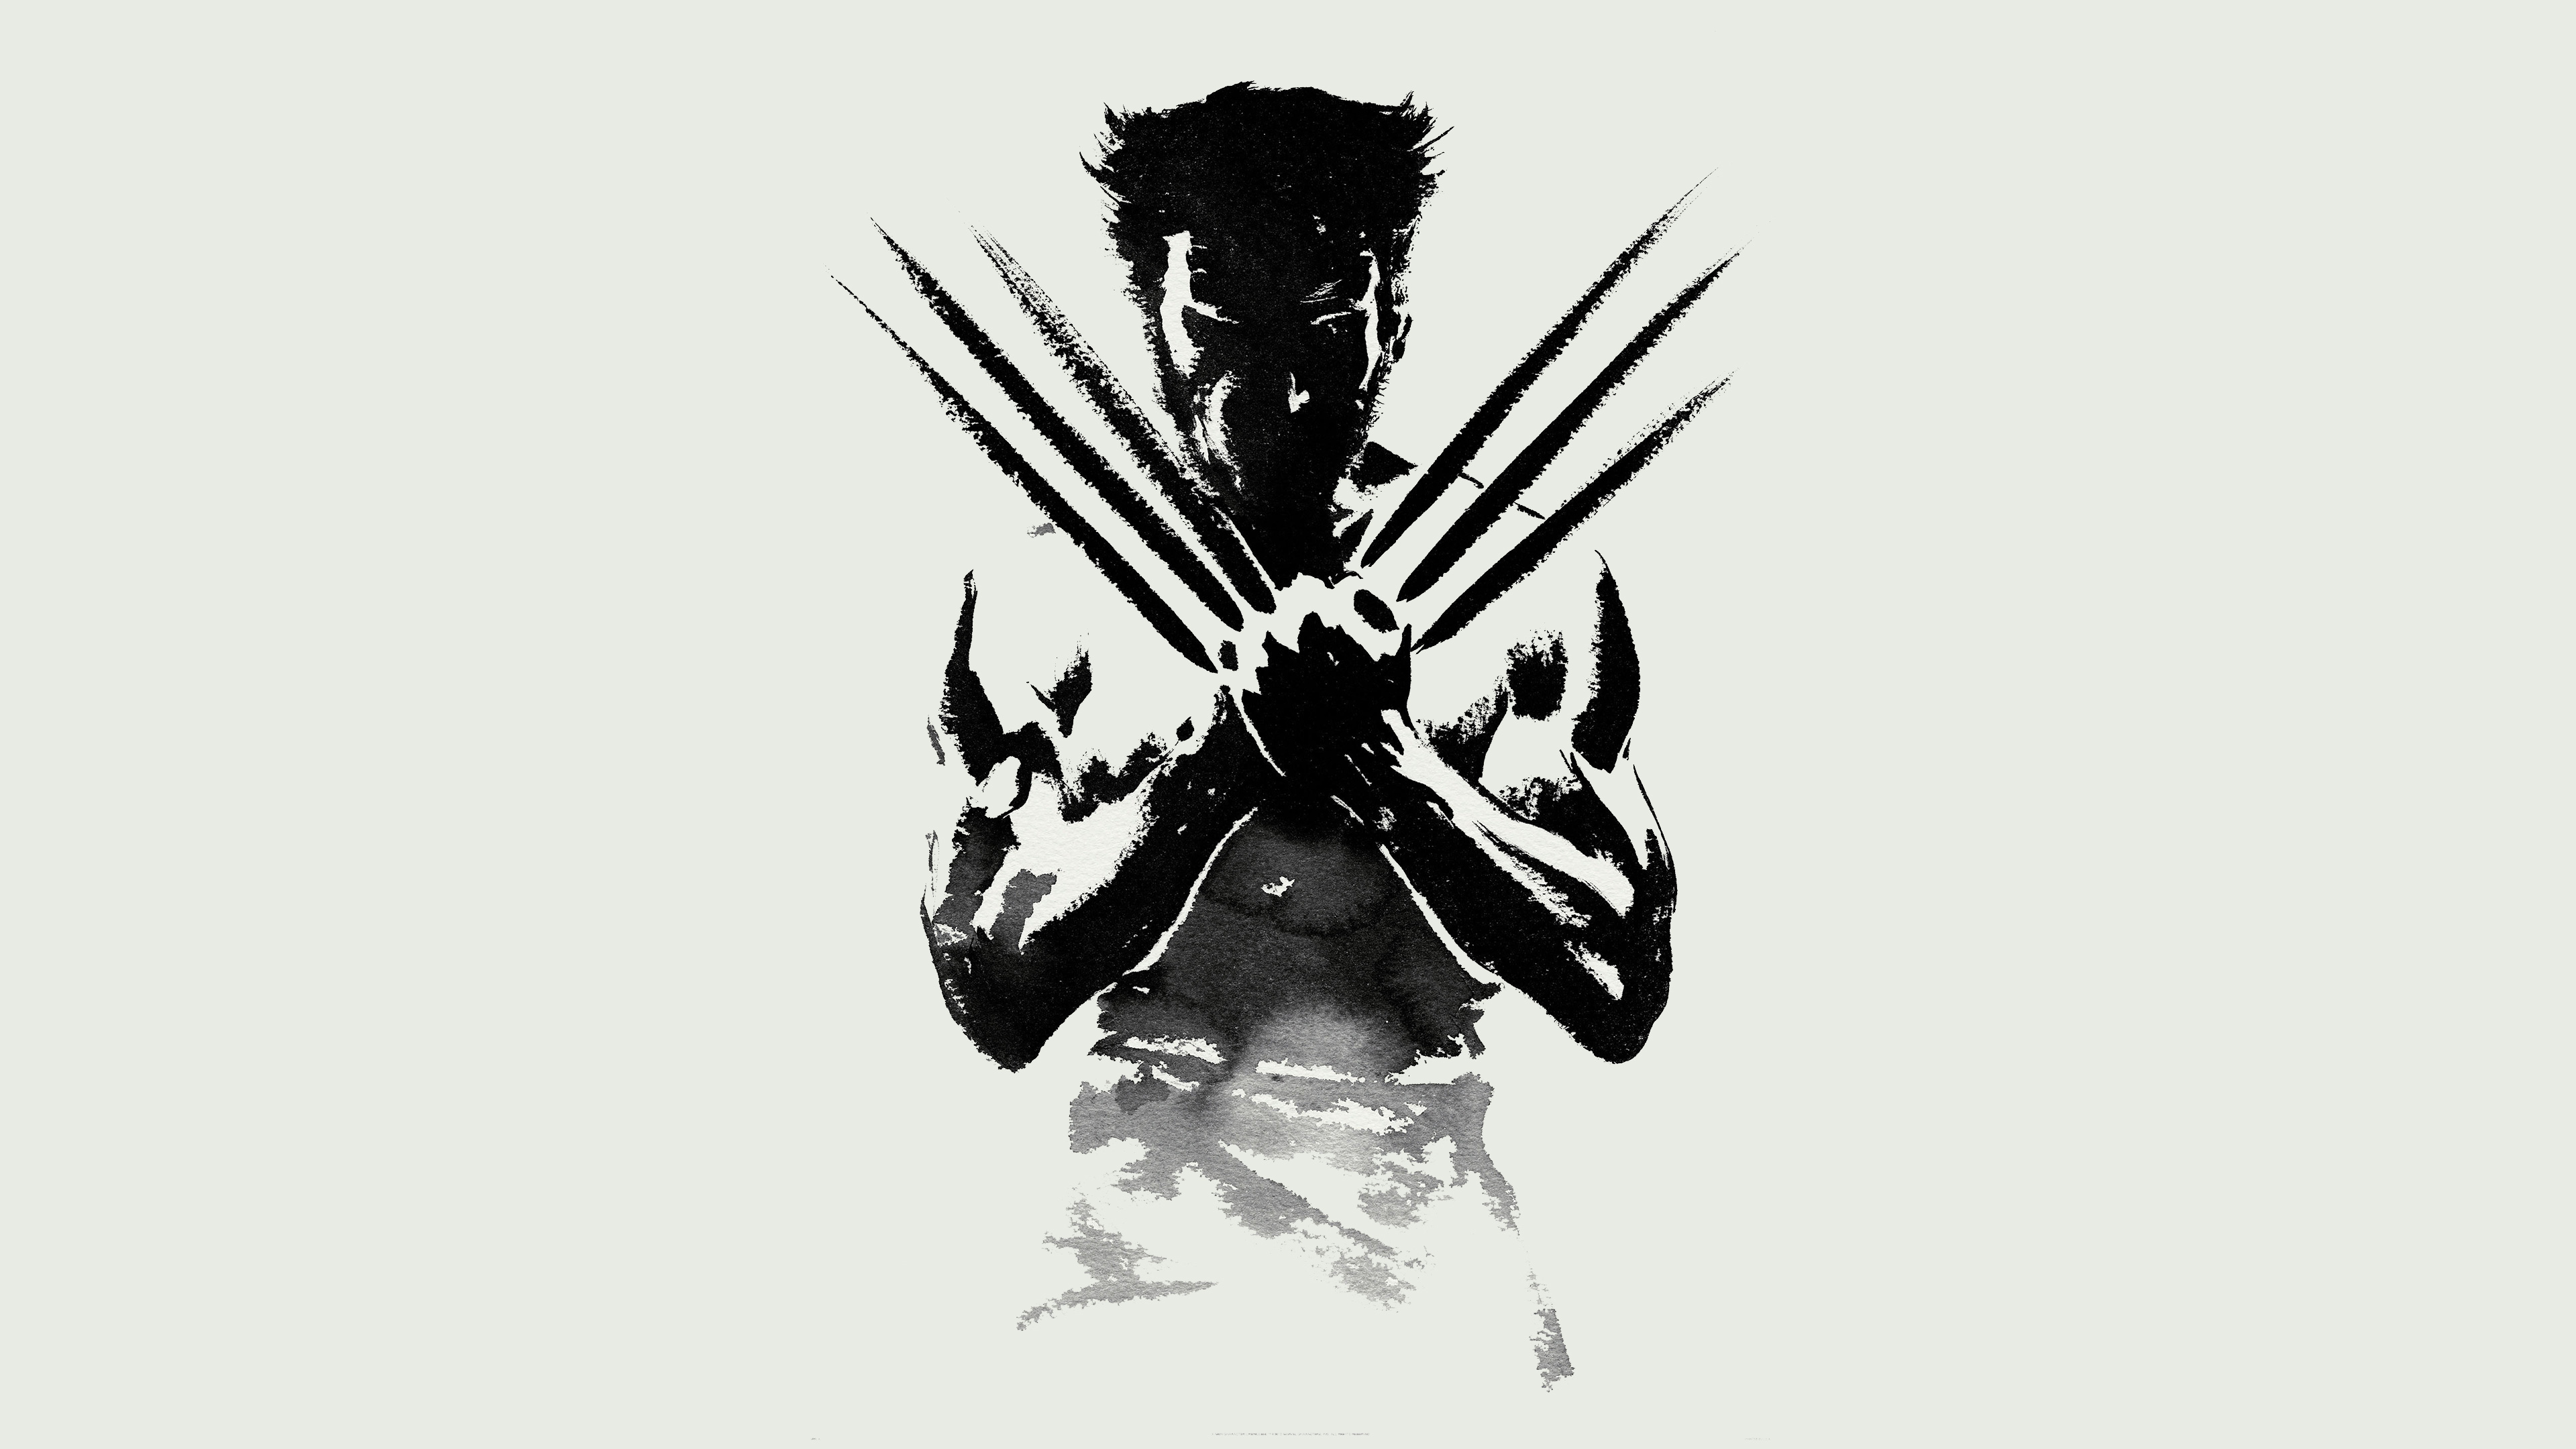 Wolverine Art 4k Hd Superheroes 4k Wallpapers Images Backgrounds